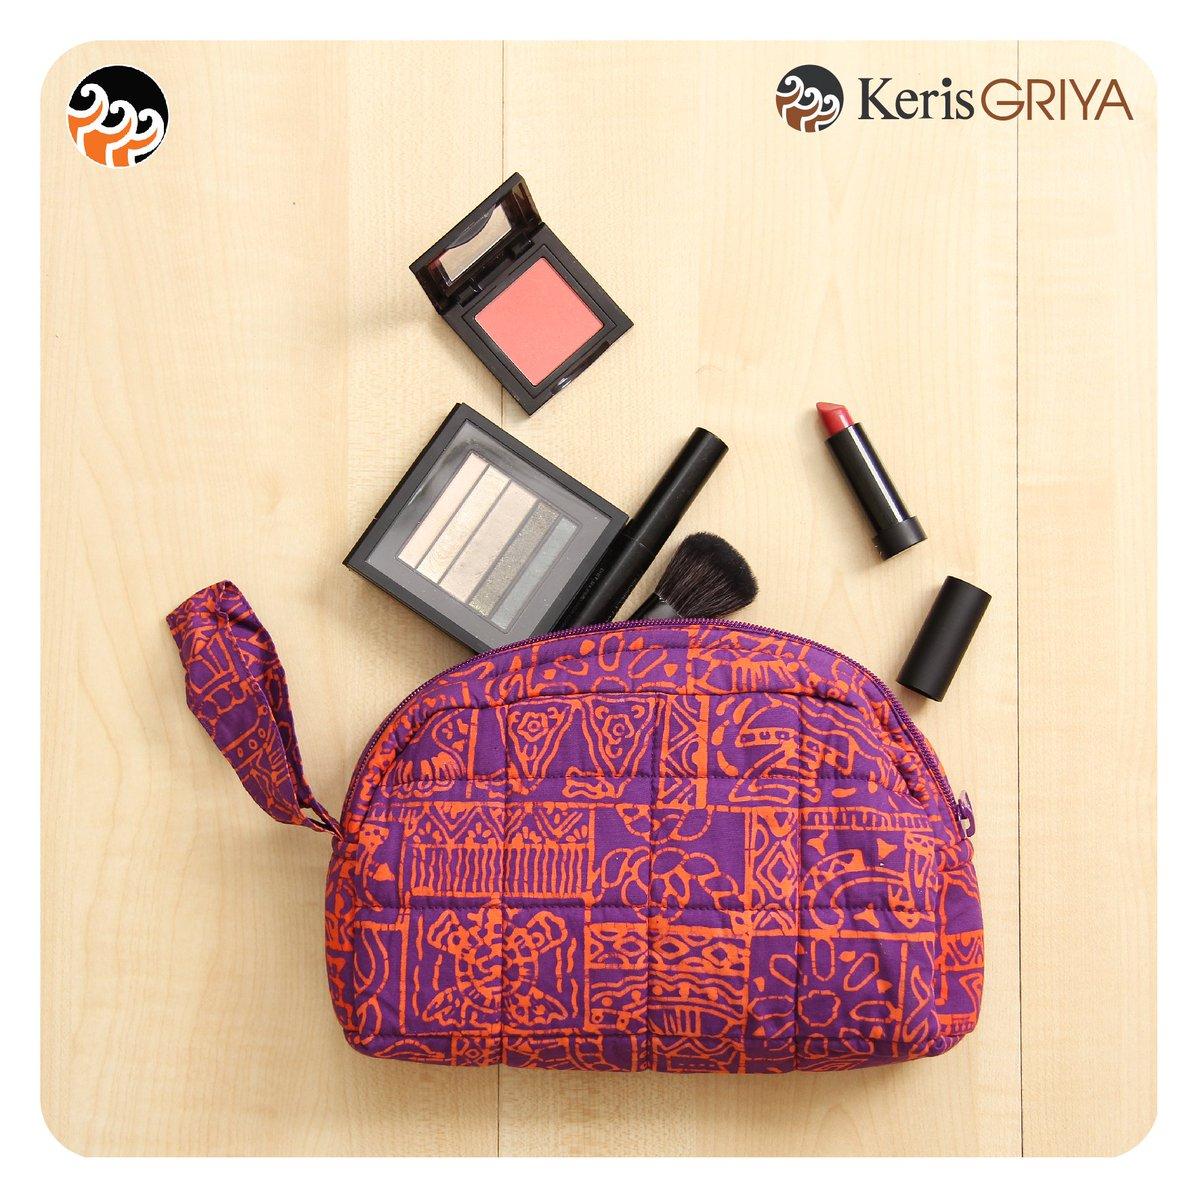 Batik Keris On Twitter Dompet Kosmetik Koleksi Griya By Sangat Nyaman Buat Dibawa Traveling Atau Untuk Aktivitas Sehari Hari